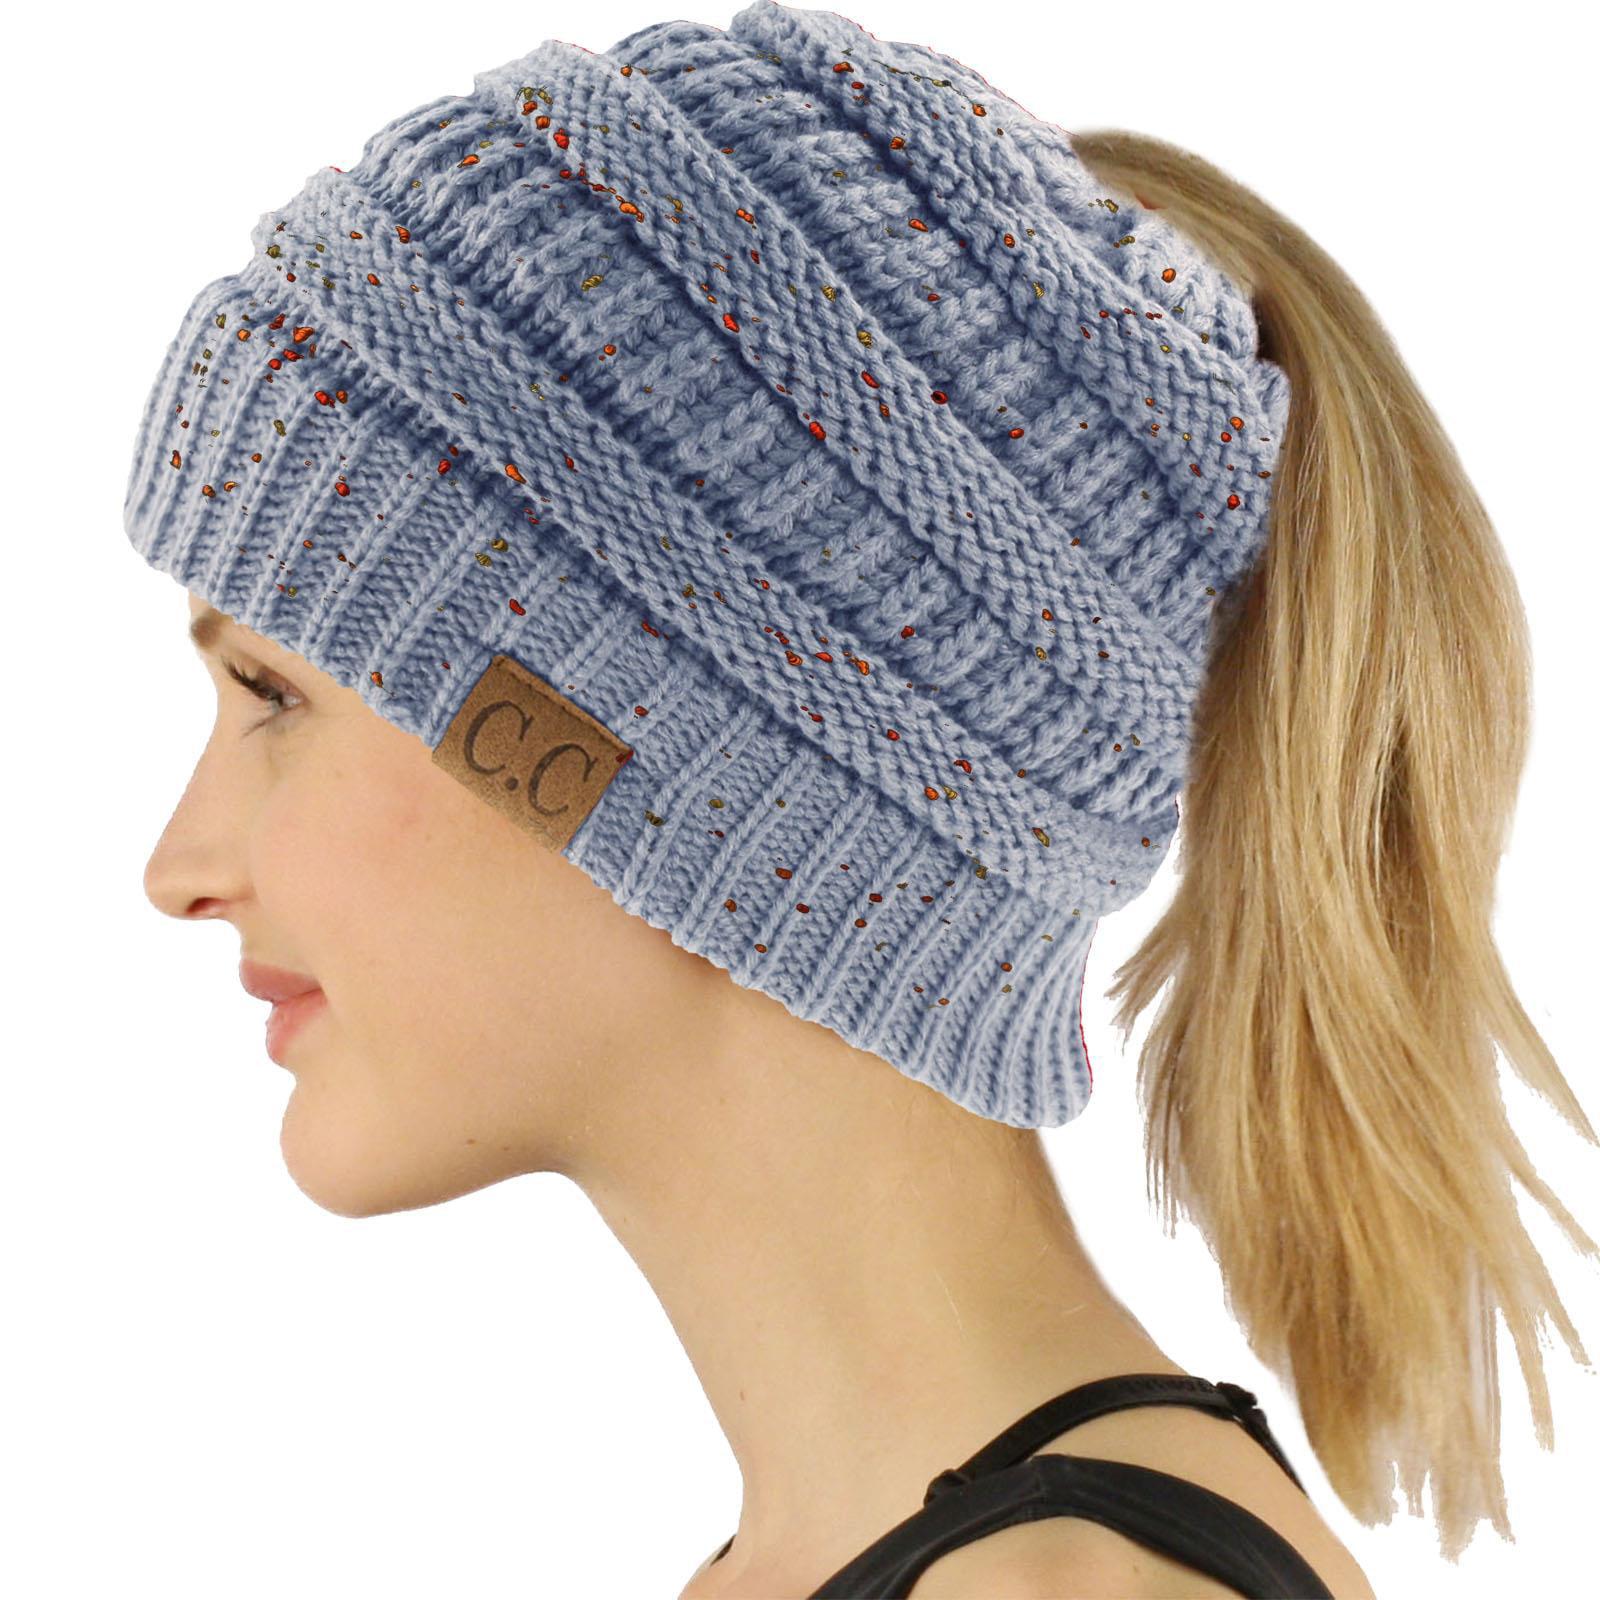 a9ea441493e C.C BeanieTail Soft Stretch Cable Knit Messy High Bun Ponytail Beanie Hat